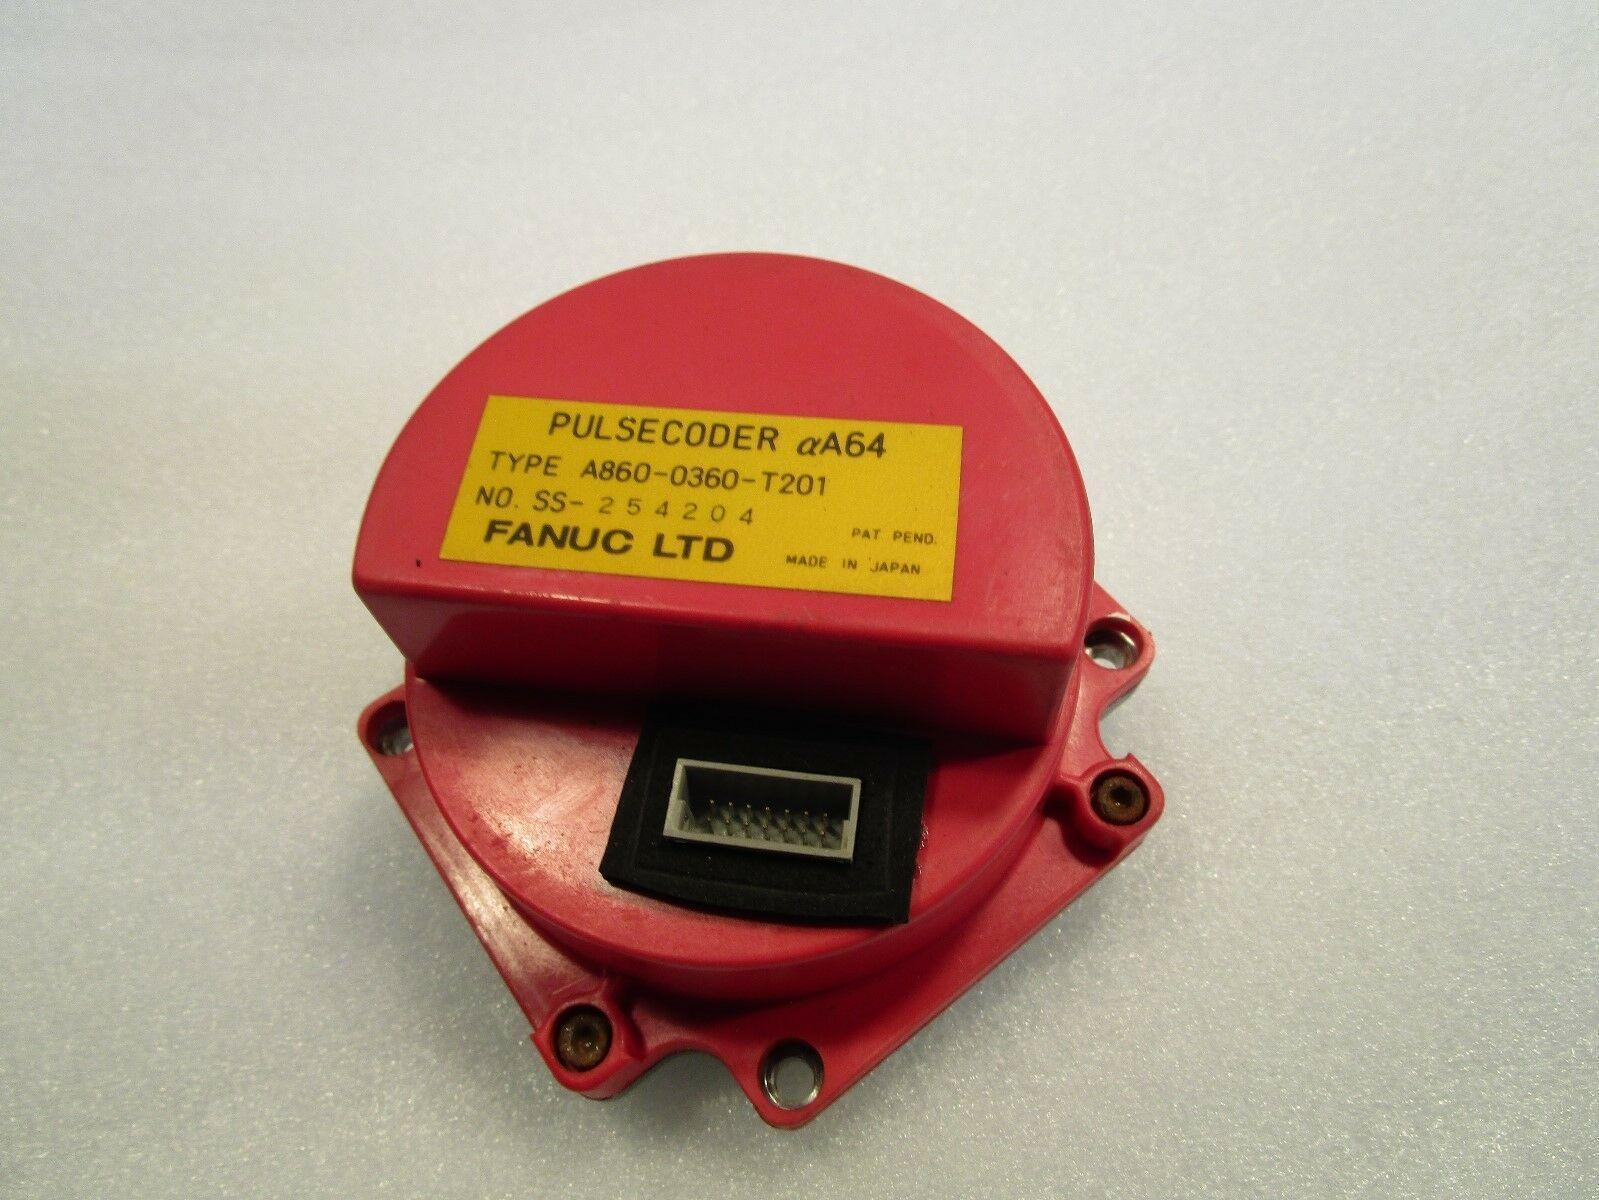 Fanuc Pulsecoder Alpha A64 A860-0360-T201 Fanuc Servo Encoder